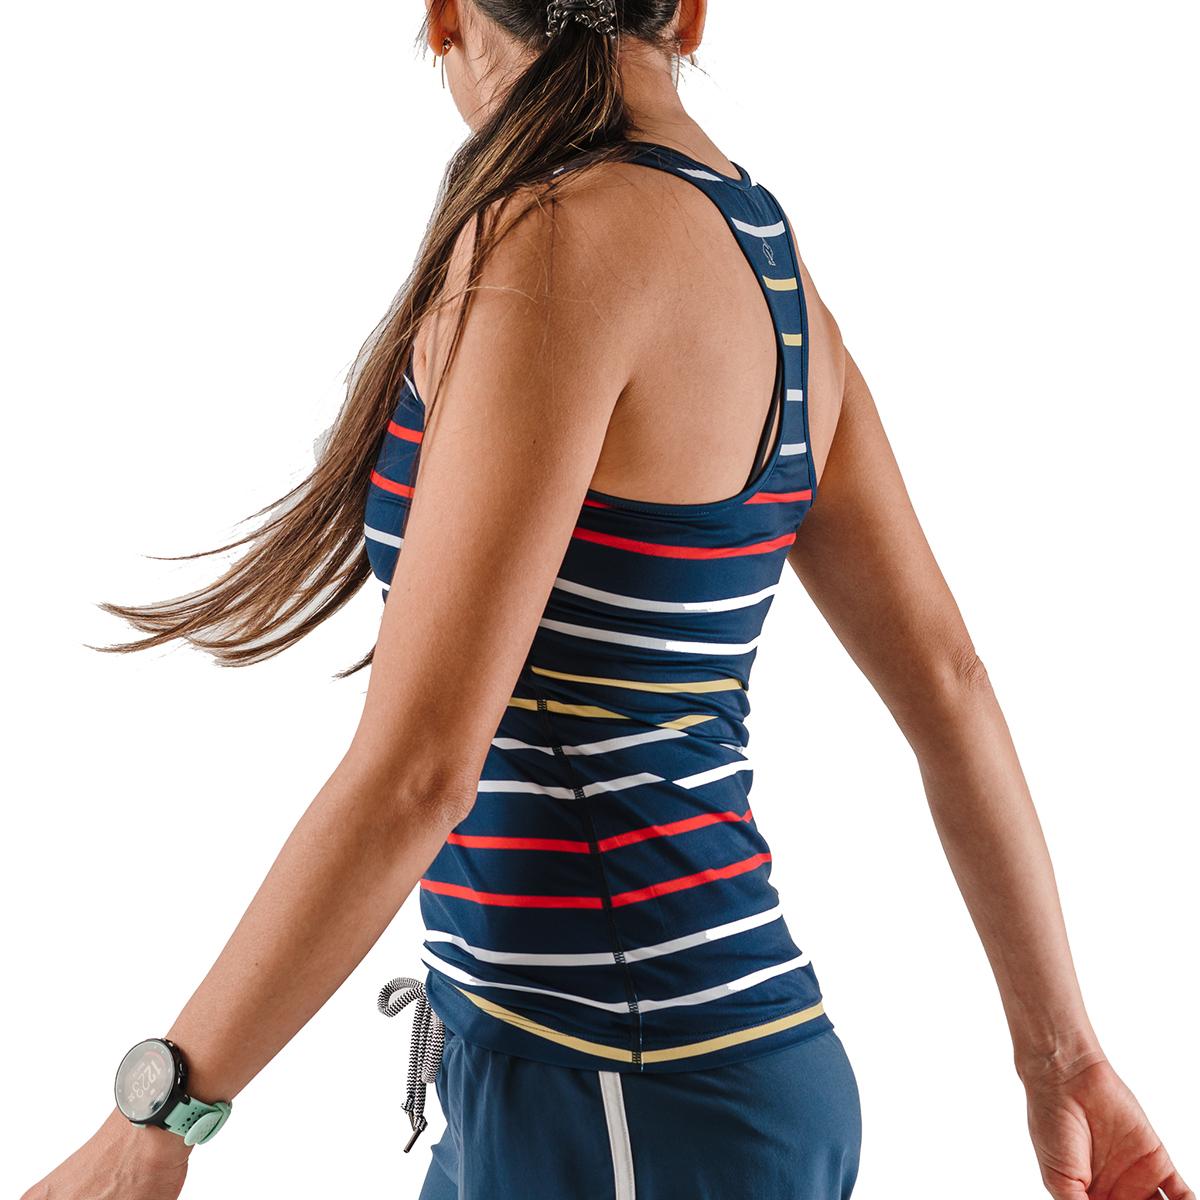 Women's Rabbit Bunny Hop Tank - Color: Dress Blues Stripe - Size: XS, Dress Blues Stripe, large, image 4